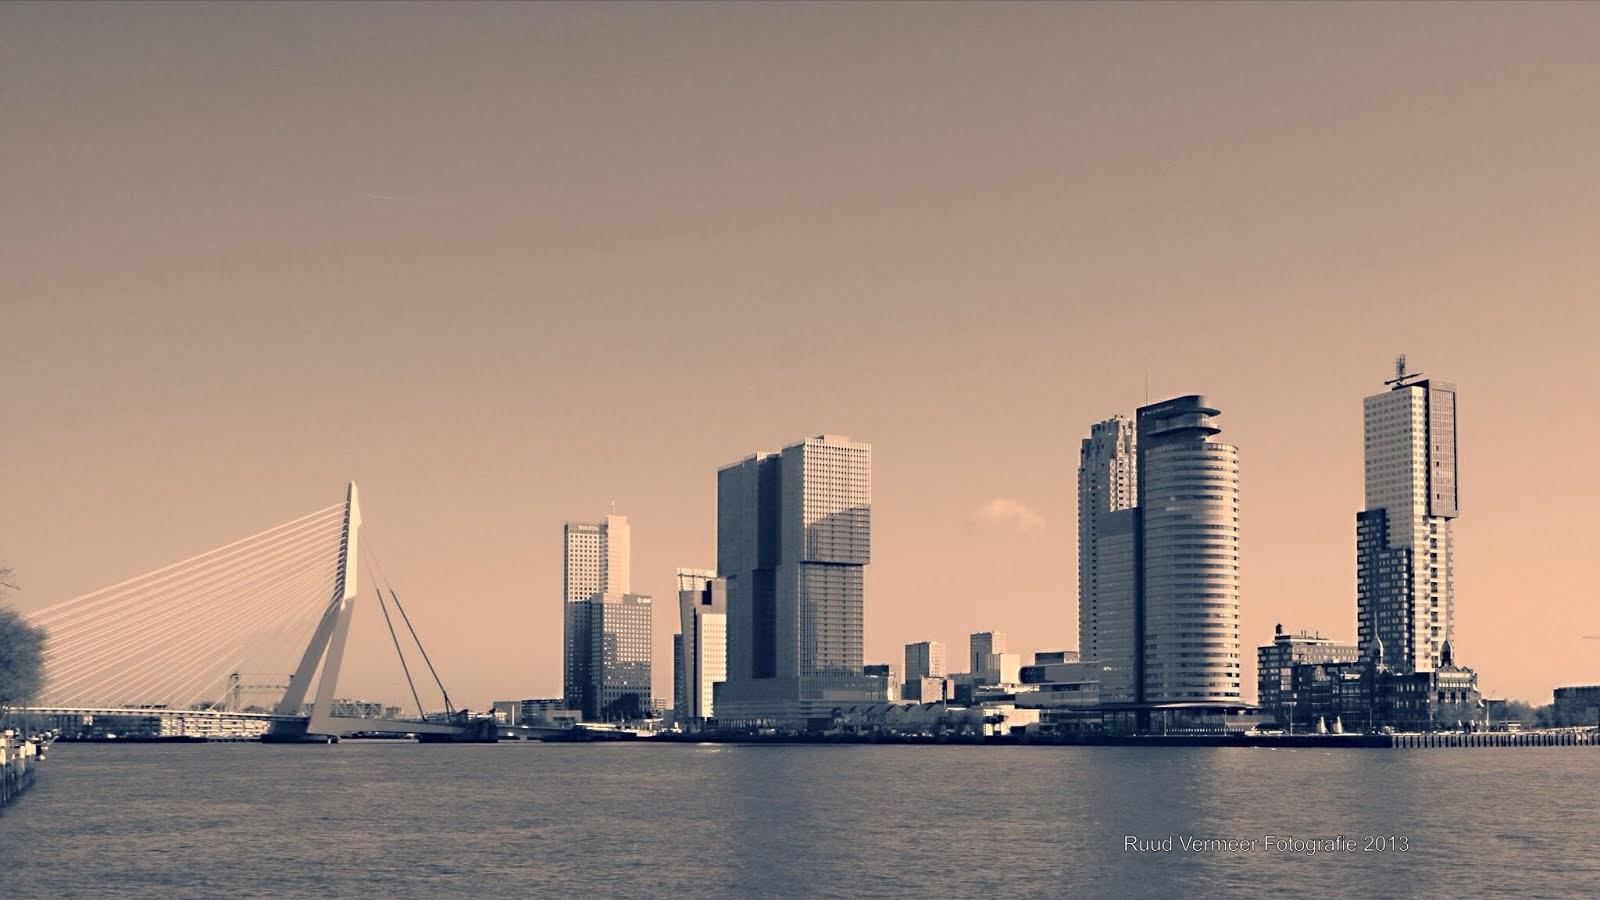 Skyline Rotterdam Ruud Vermeer Fotografie